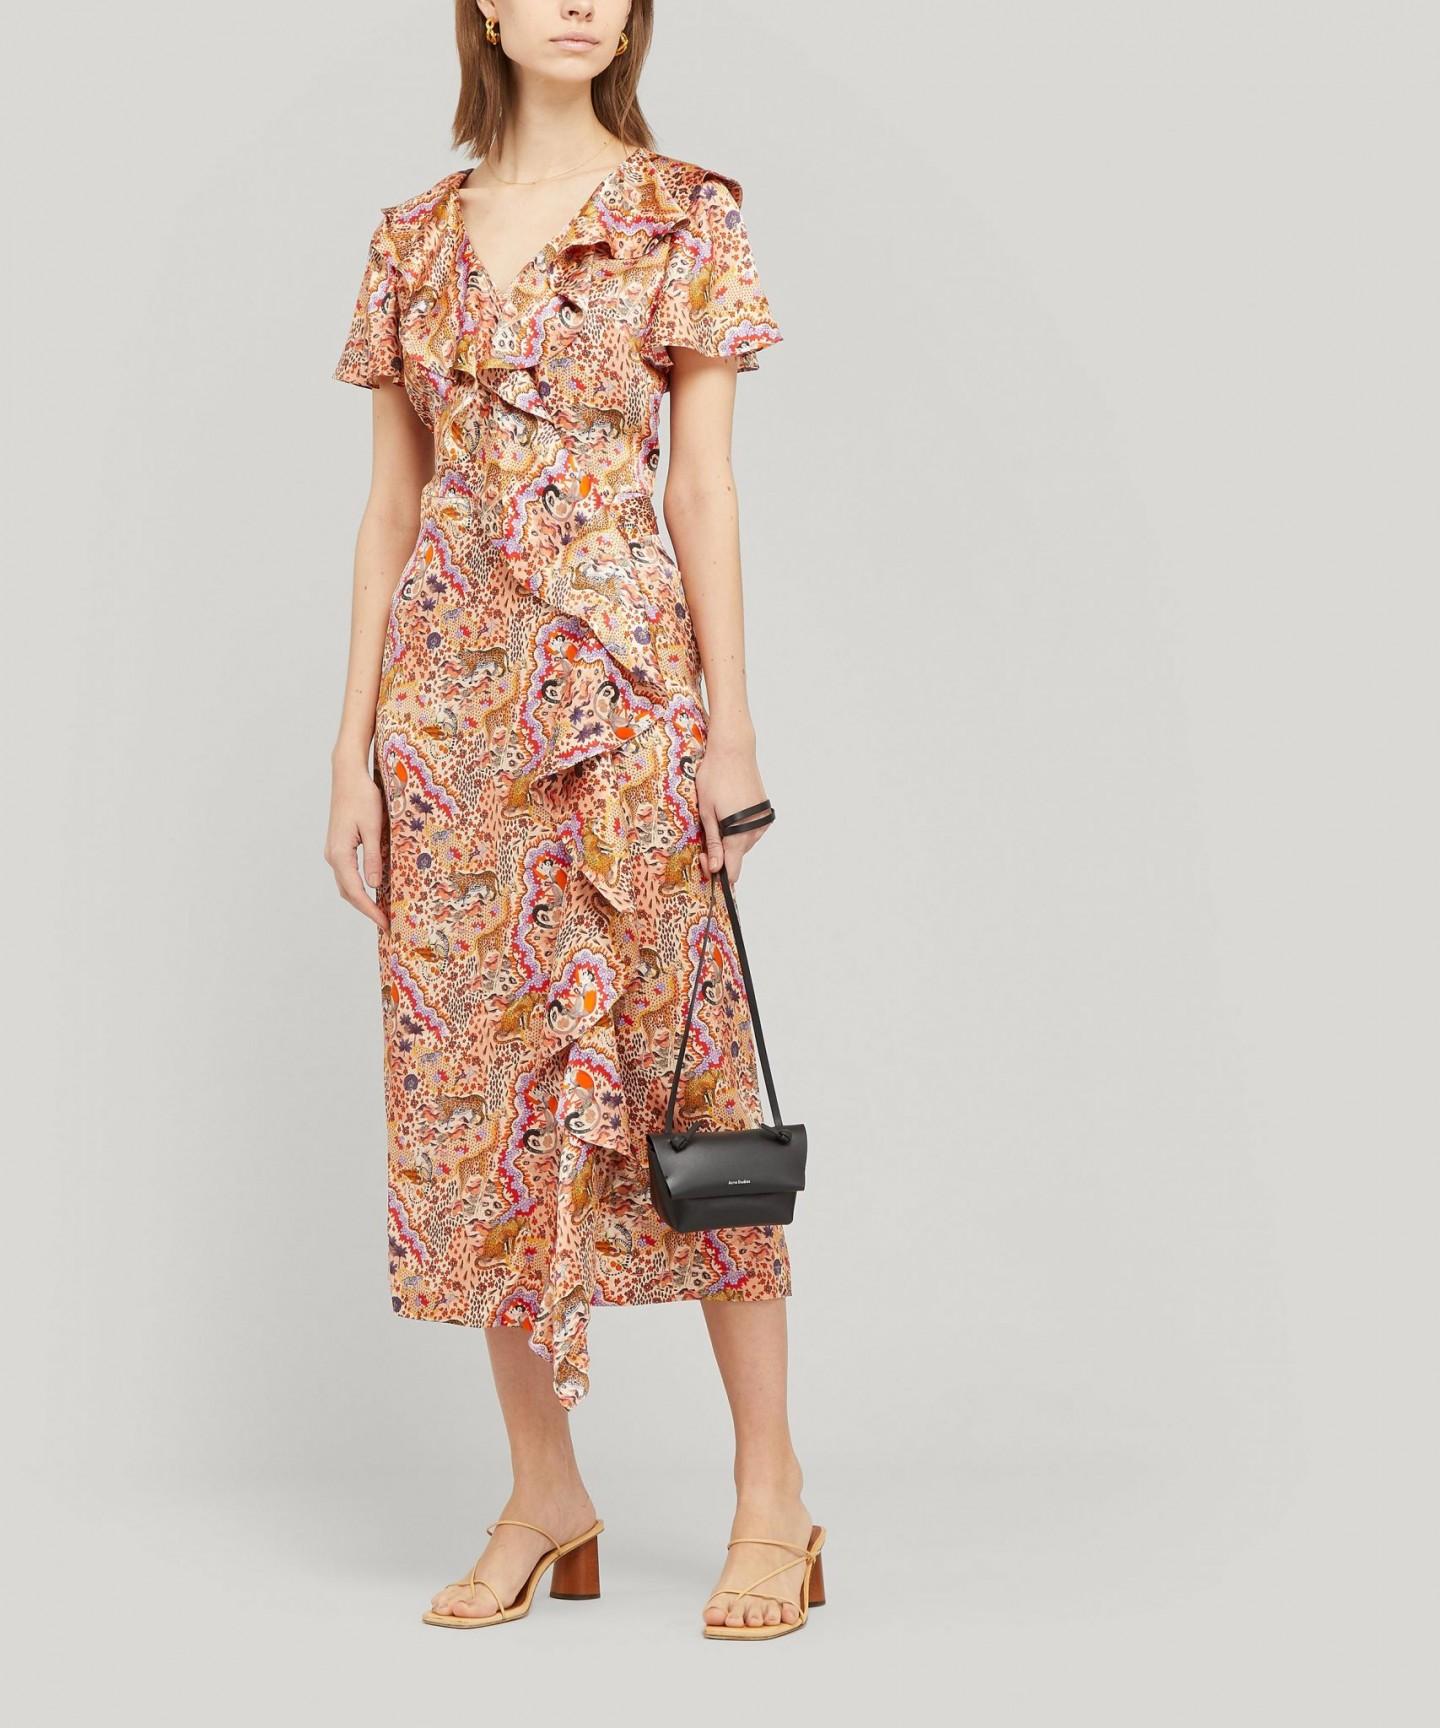 LIBERTY Maxine Silk Satin Ruffled Wrap Dress